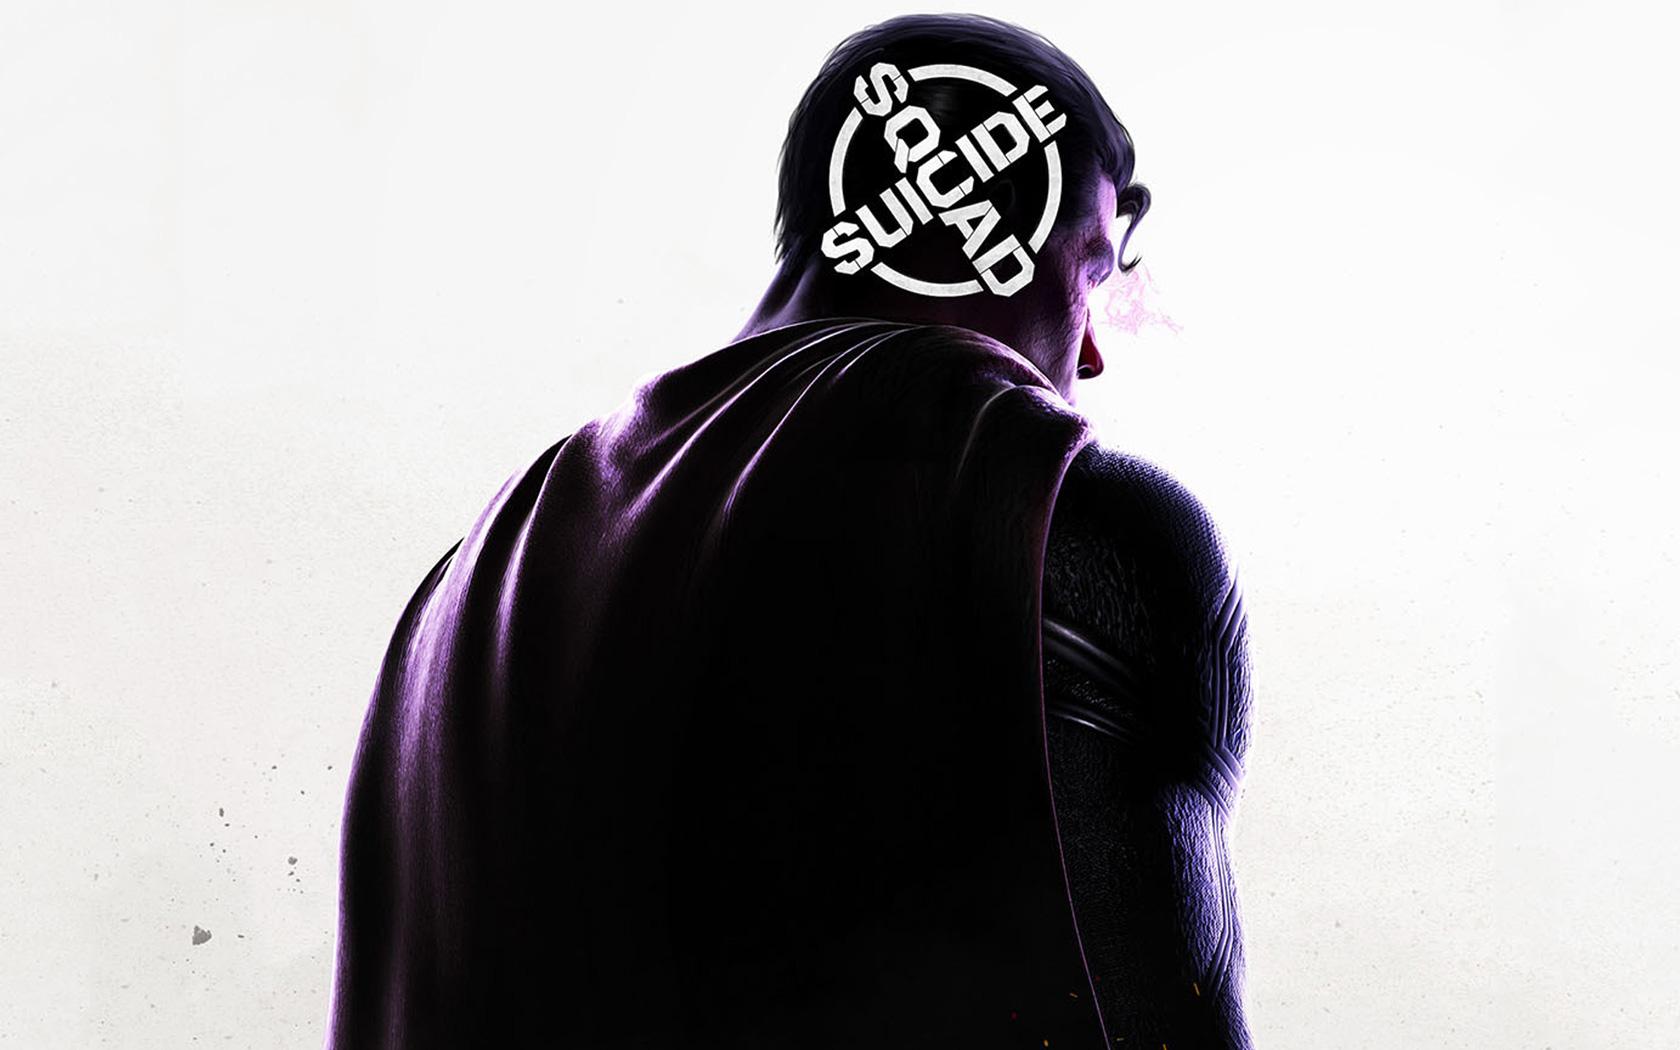 Free Suicide Squad: Kill the Justice League Wallpaper in 1680x1050